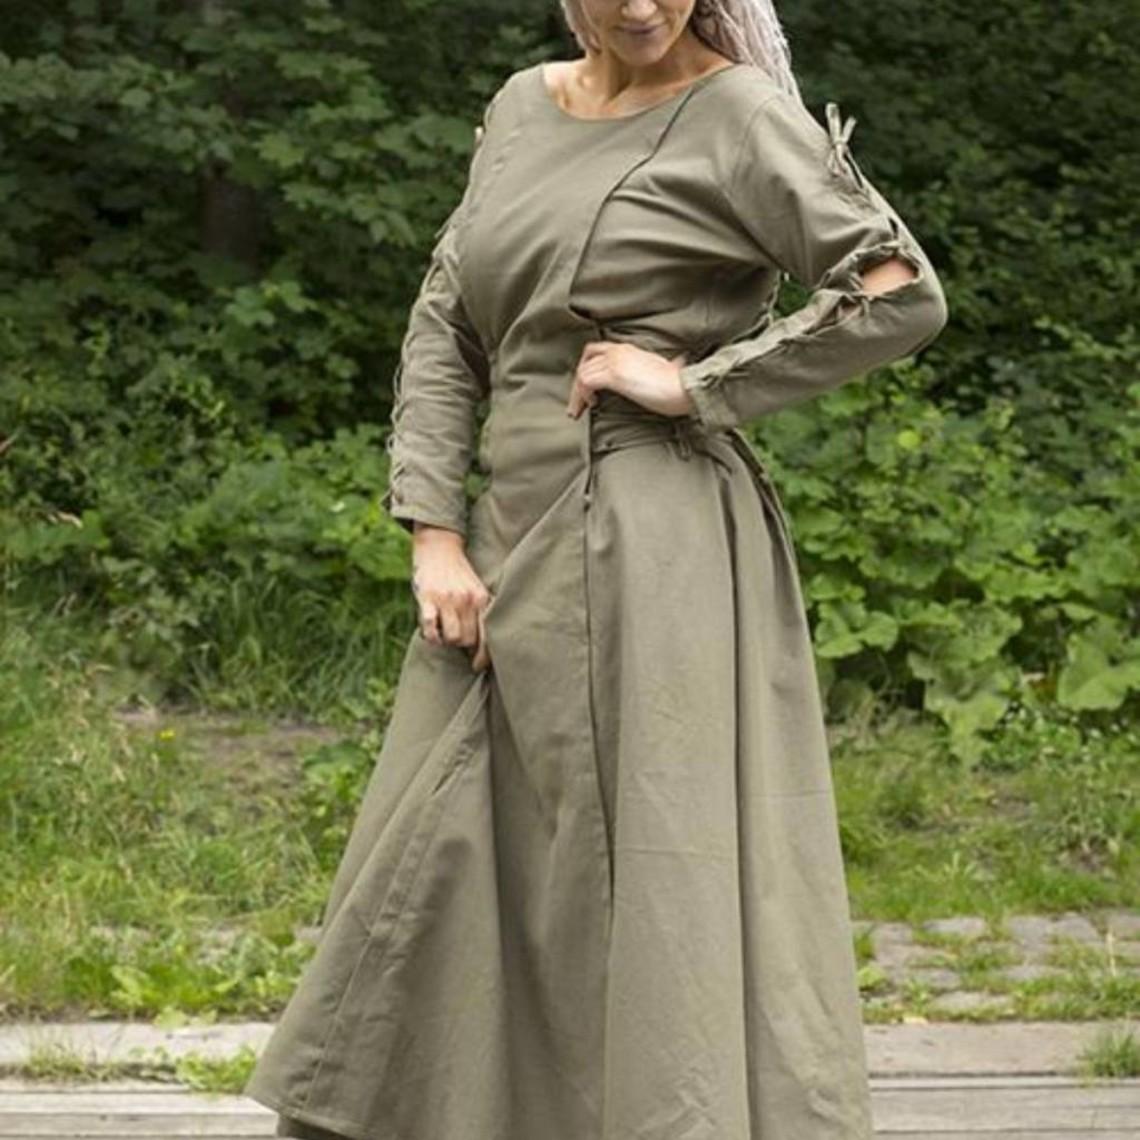 Epic Armoury Jurk Morgaine, groen